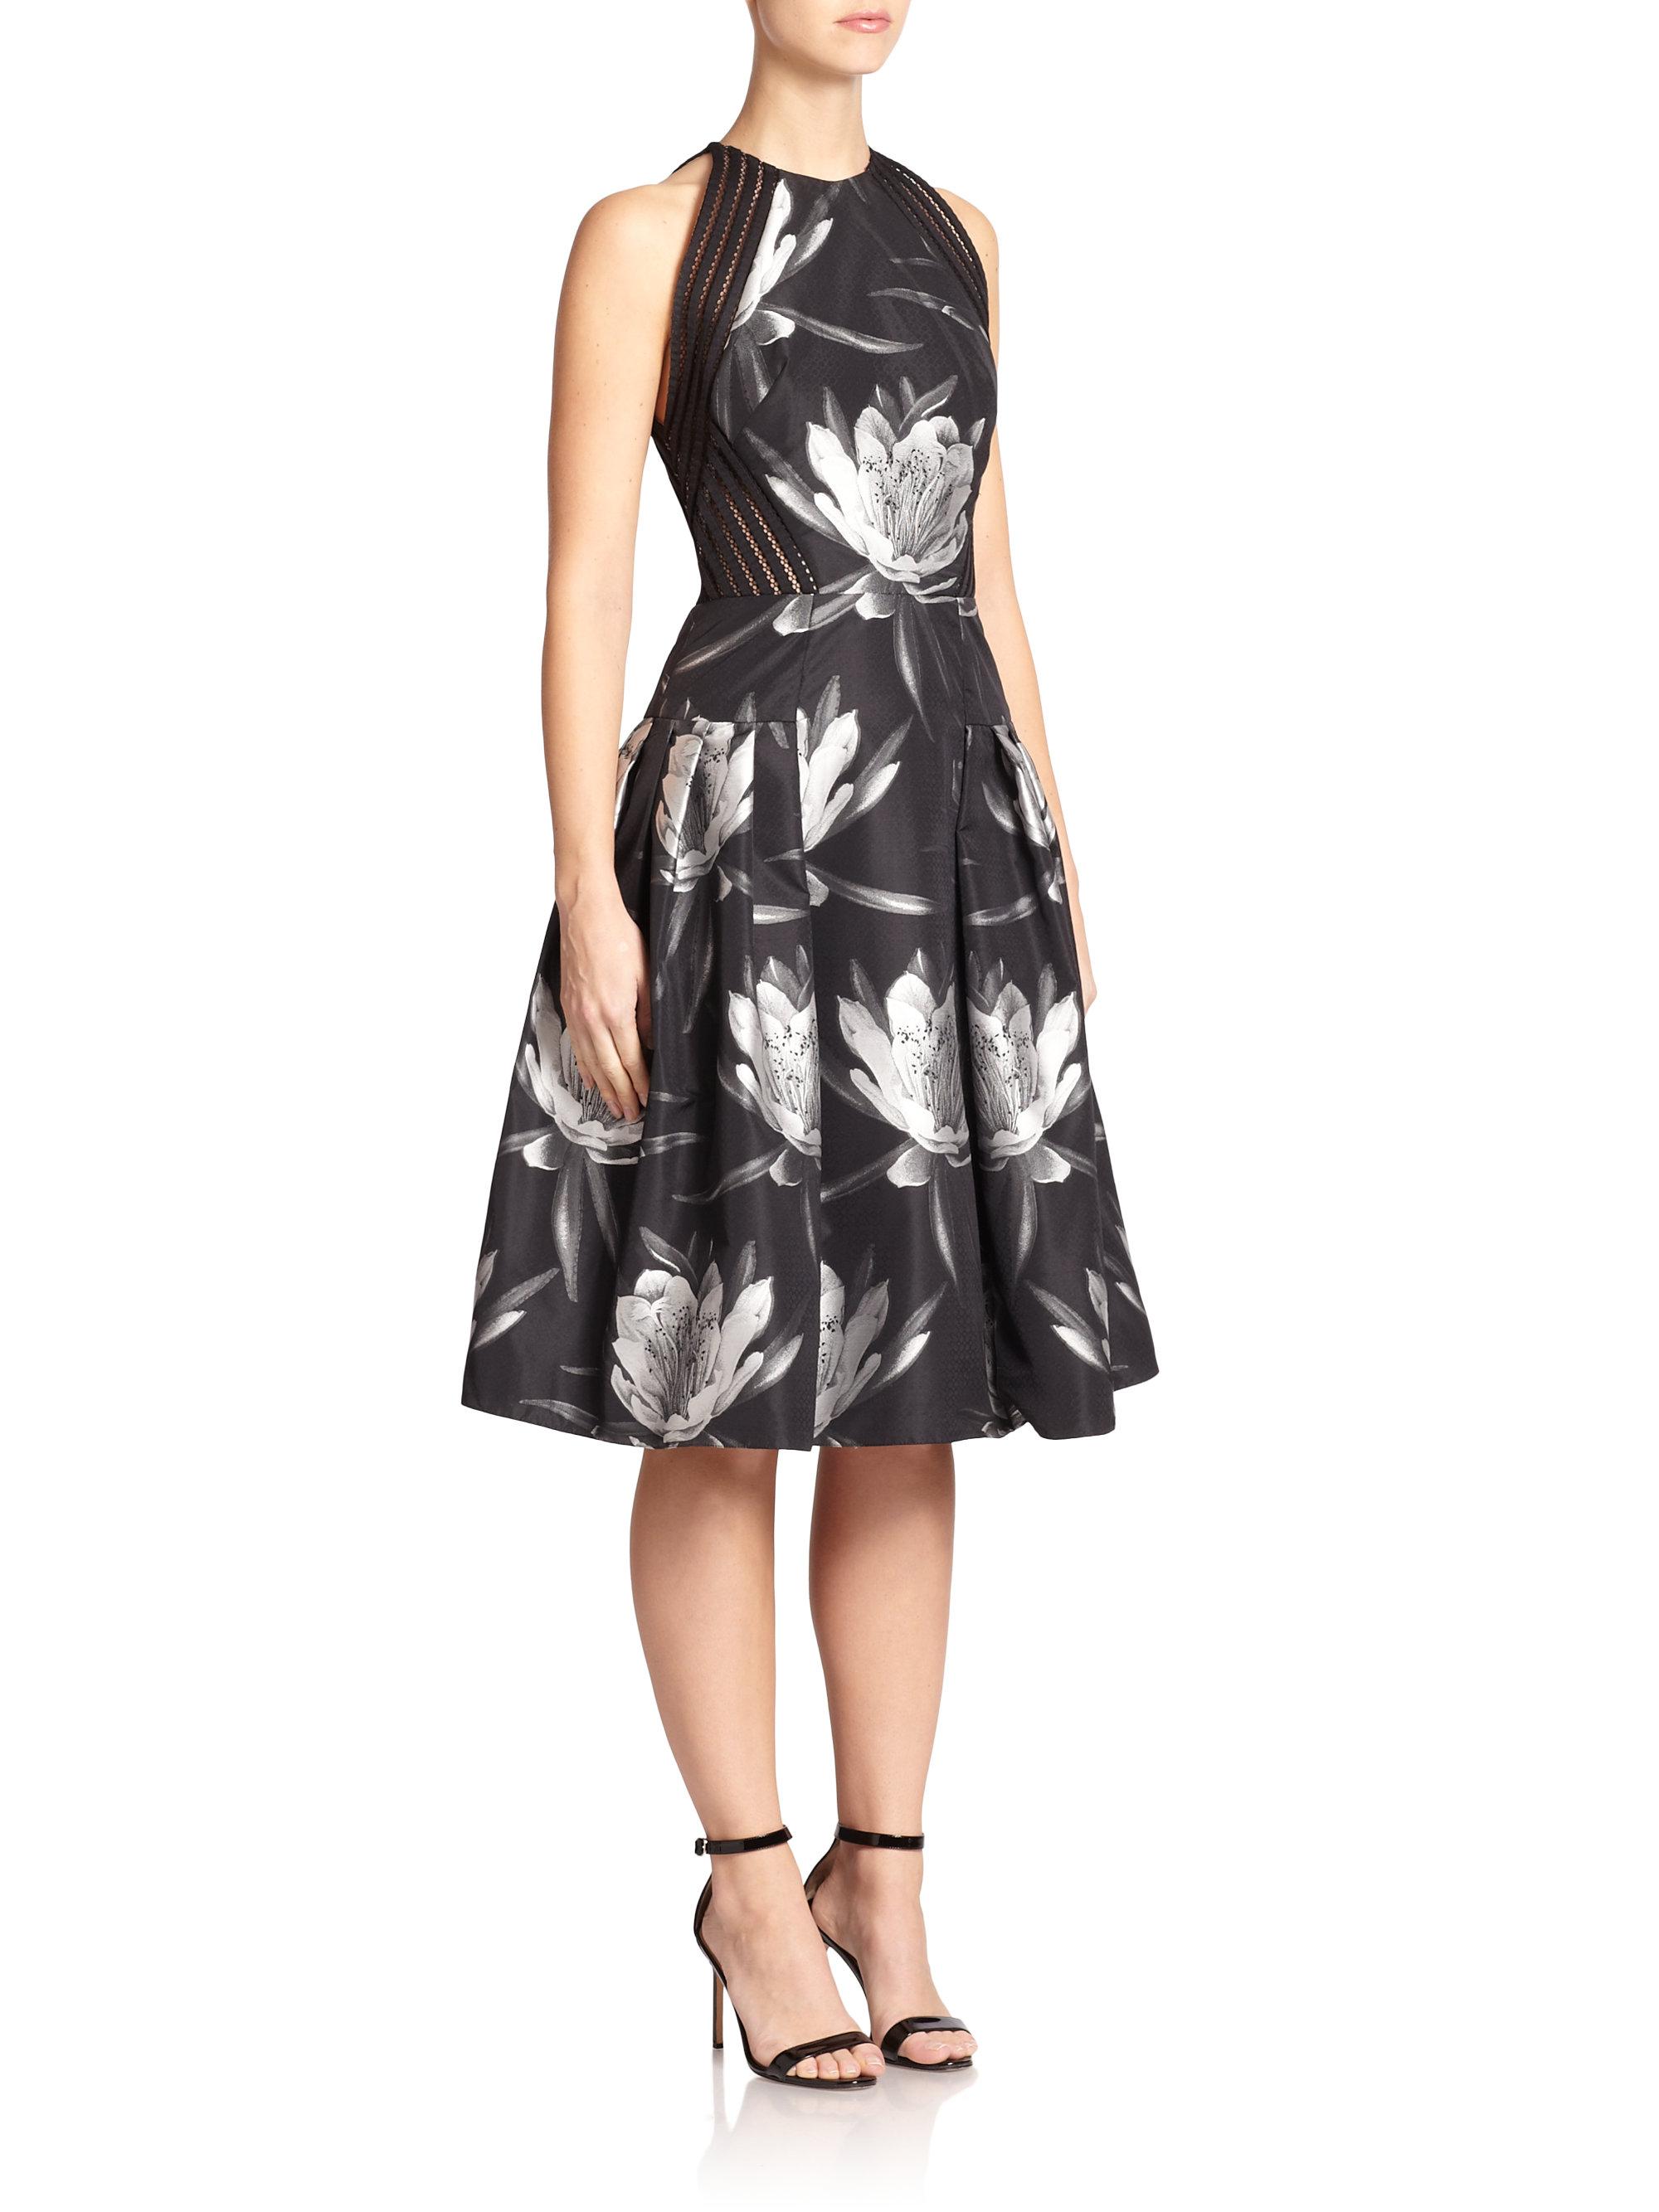 Lyst Carmen Marc Valvo Floral Jacquard Dress In Black